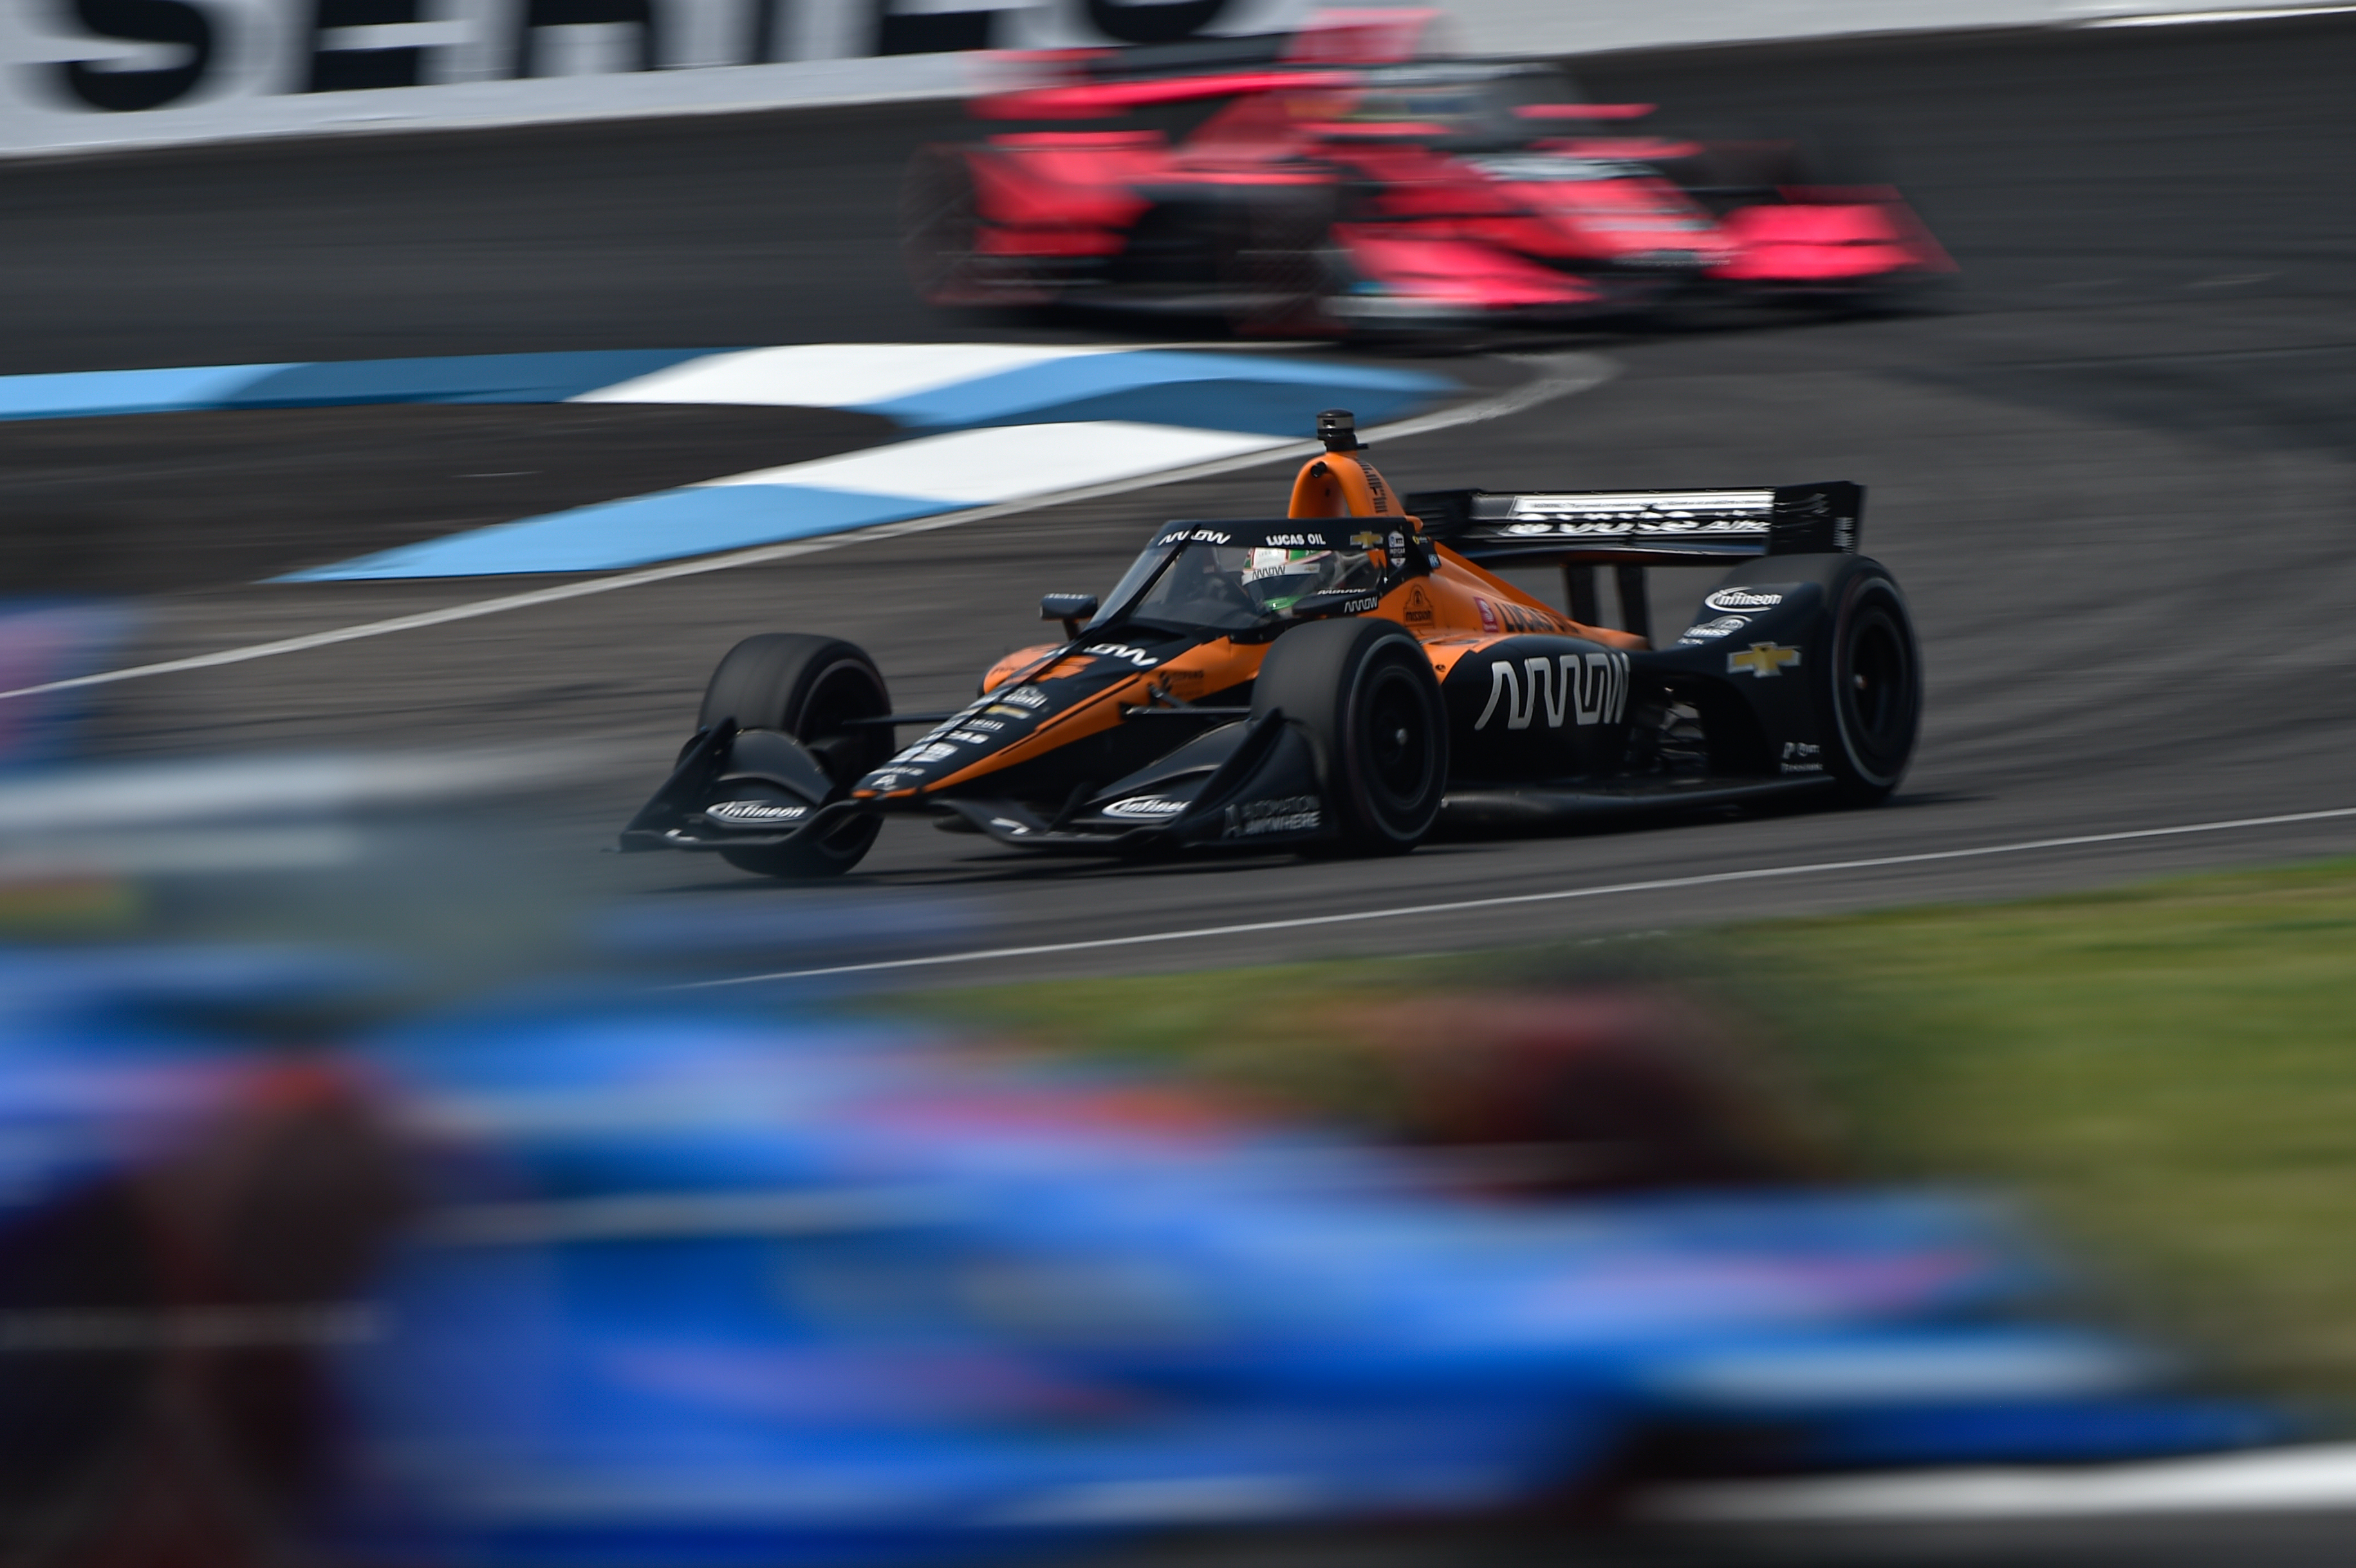 Pato O'Ward McLaren SP Indianapolis IndyCar 2020